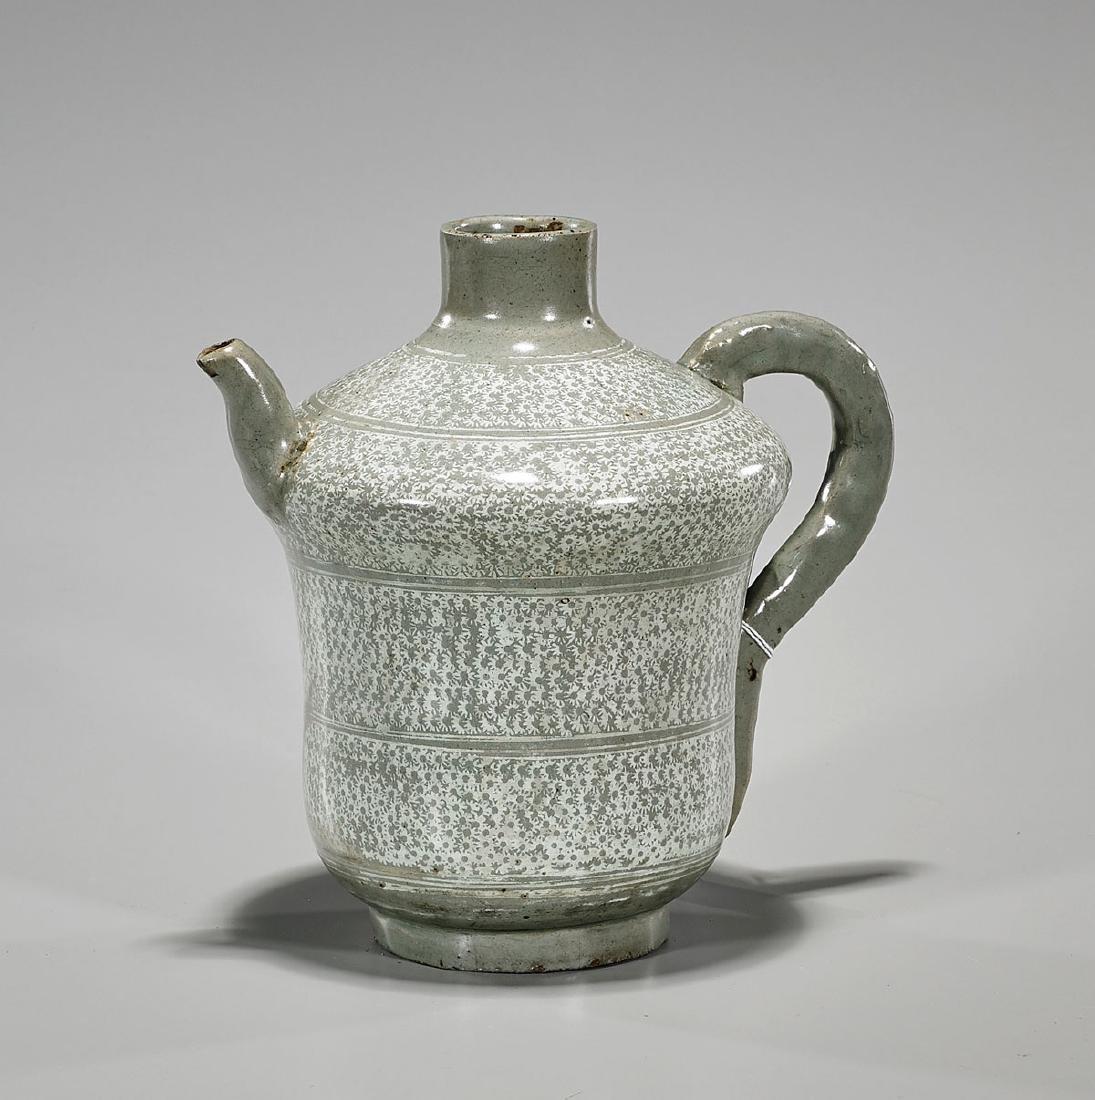 Antique Joseon Dynasty Buncheong Ewer